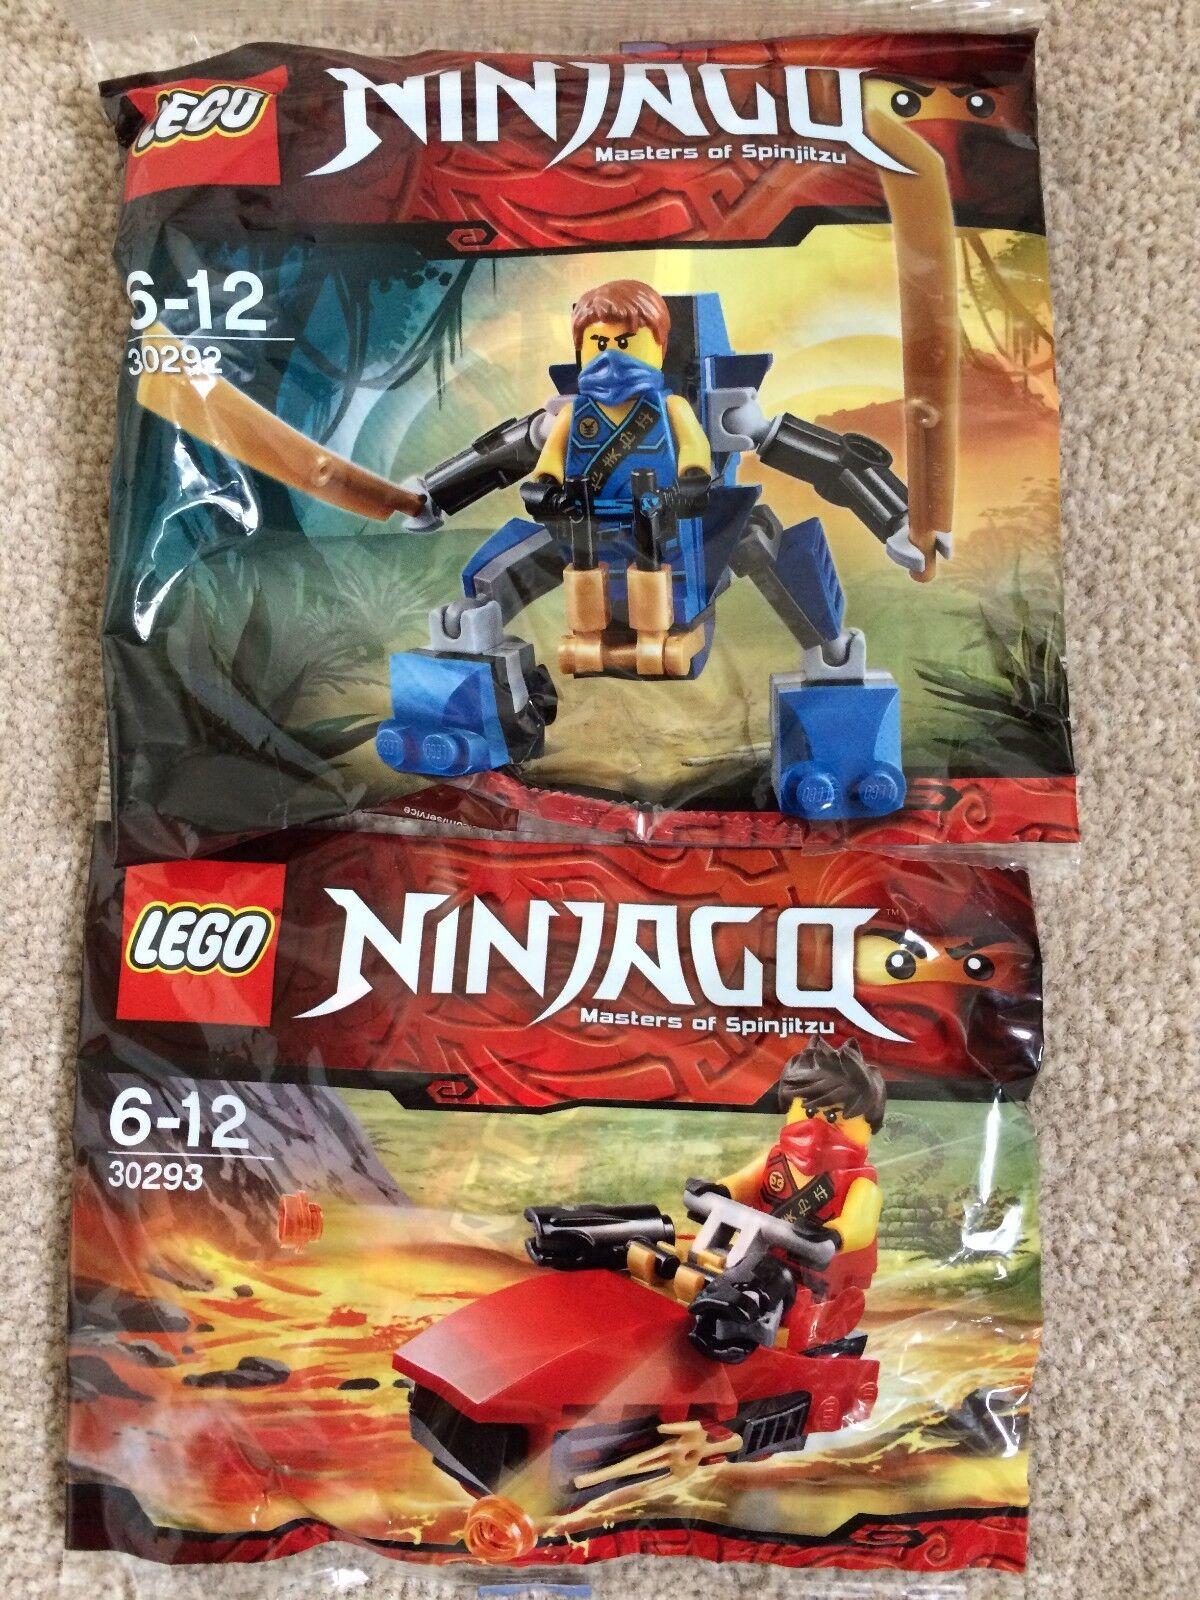 Neuf sous emballage  véritable  lego ninjago 2 x Enveloppes Jay's Nano Mech 30292 Kai's Drifter 30293